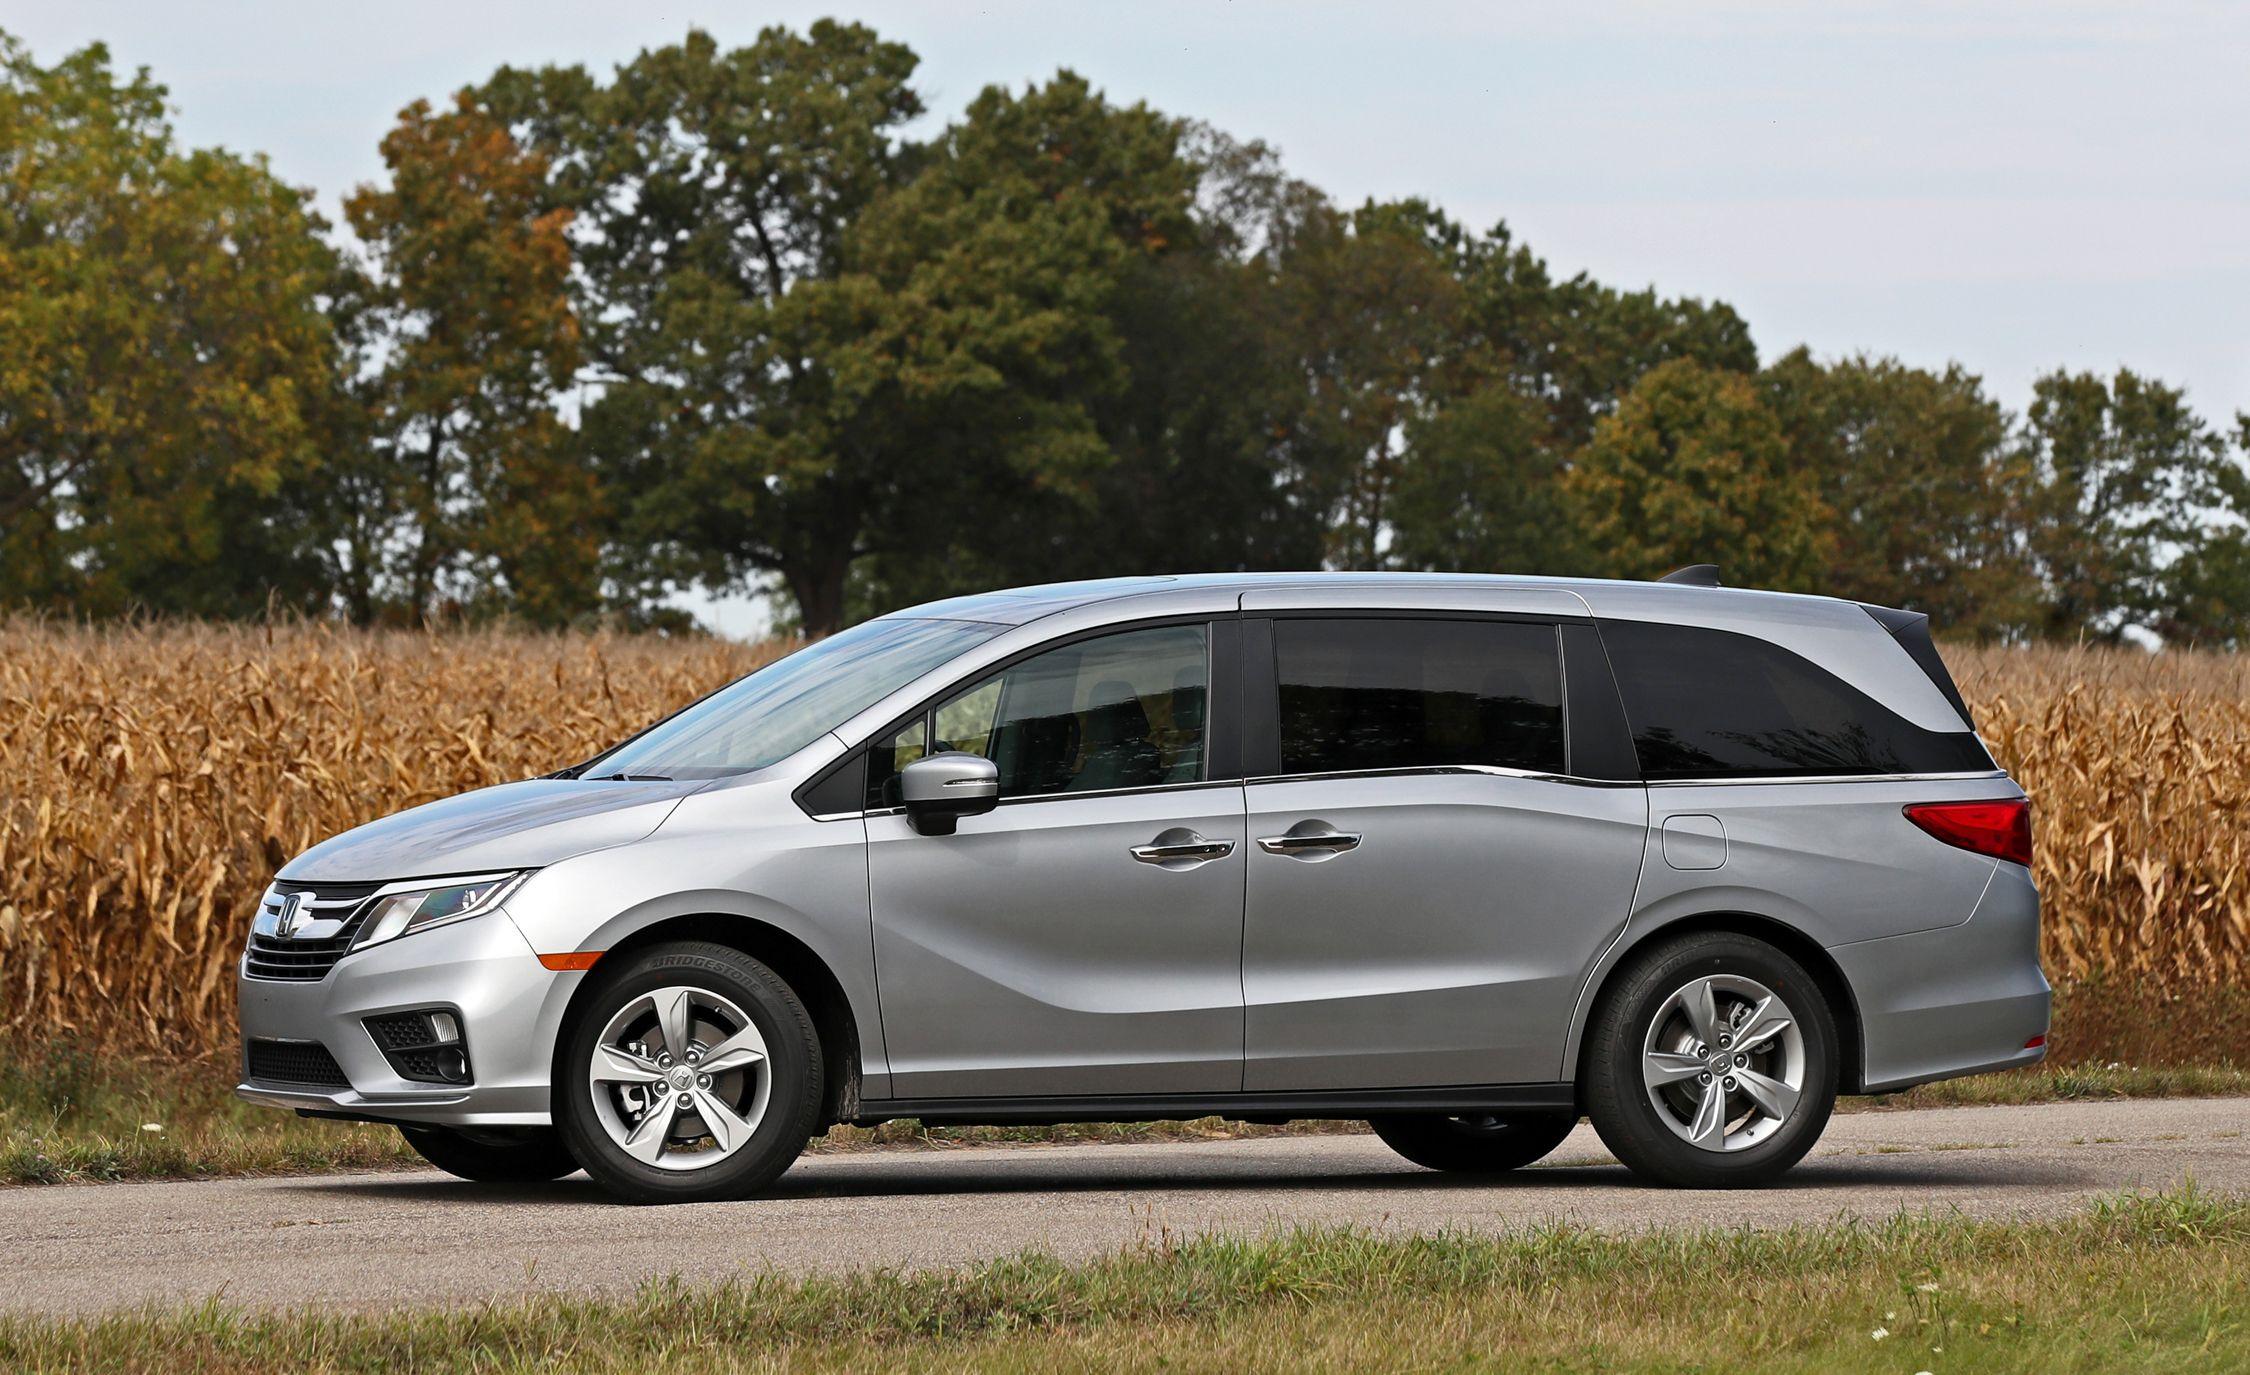 2019 Honda Odyssey Reviews Honda Odyssey Price Photos And Specs